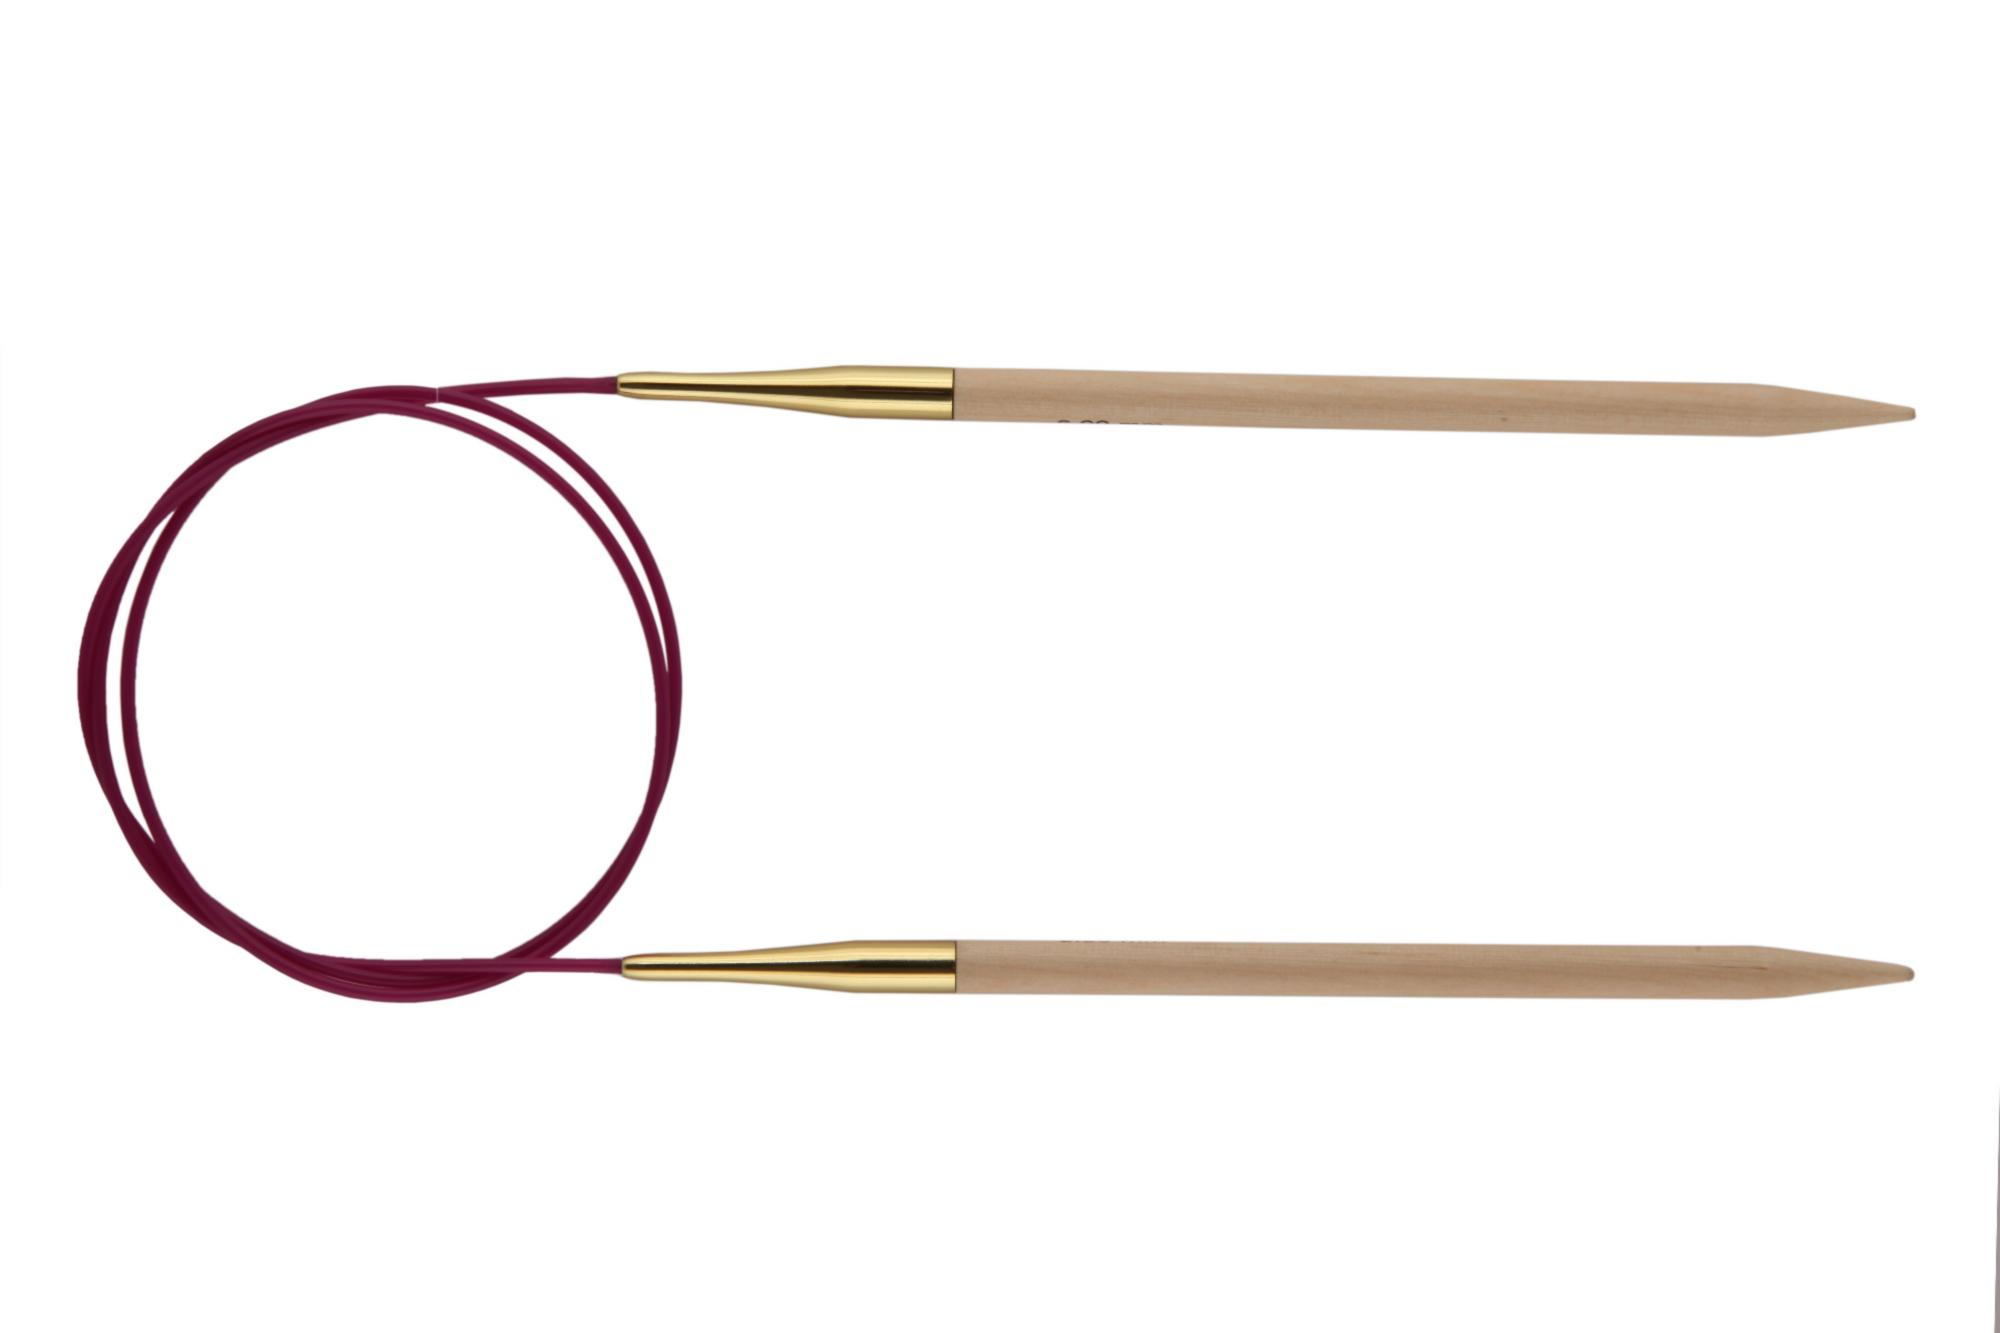 Спицы круговые 120 см Basix Birch Wood KnitPro, 35404, 4.00 мм